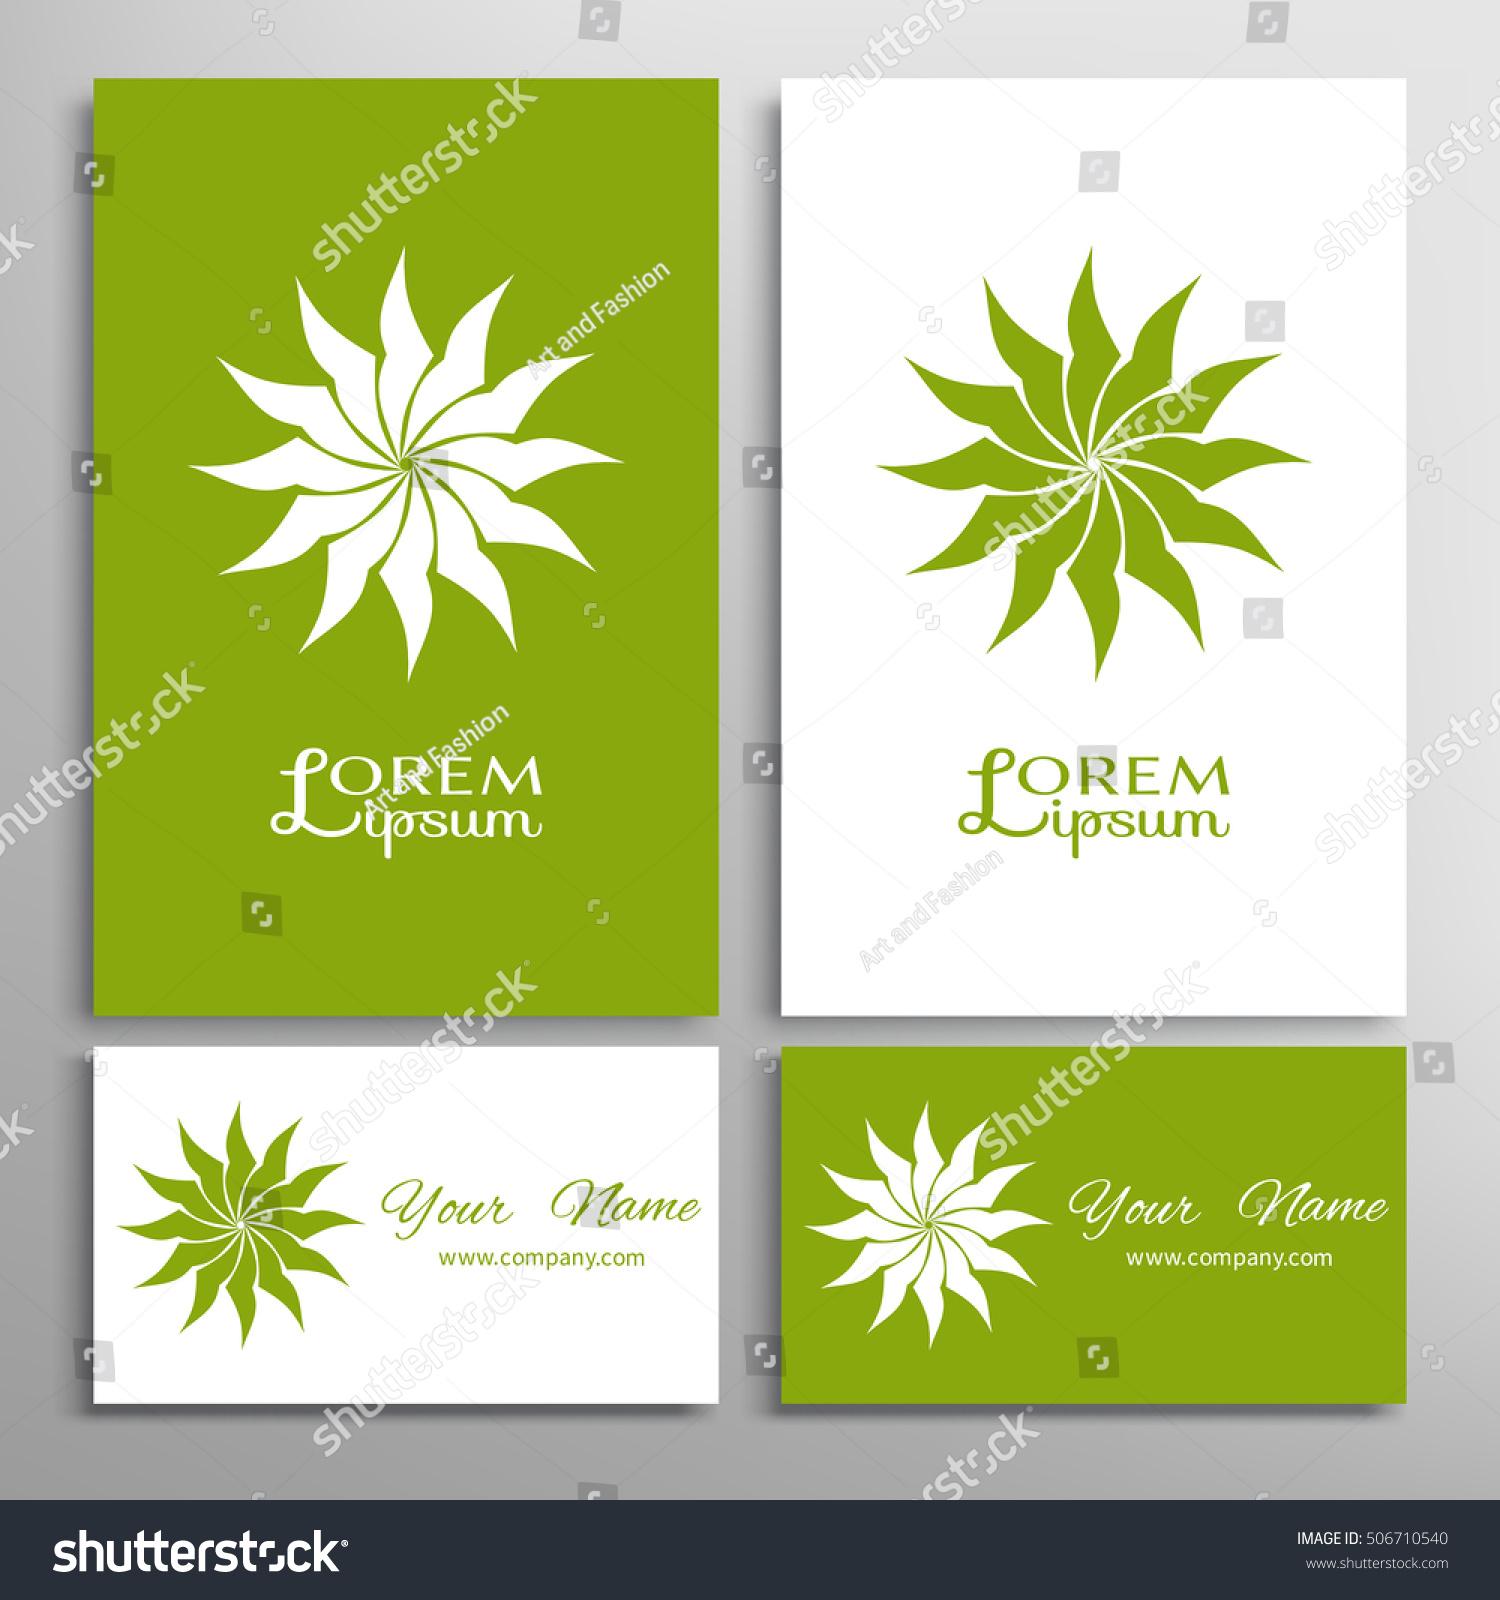 Vector Geometric Design Element Logo Icon Stock Vector 506710540 ...